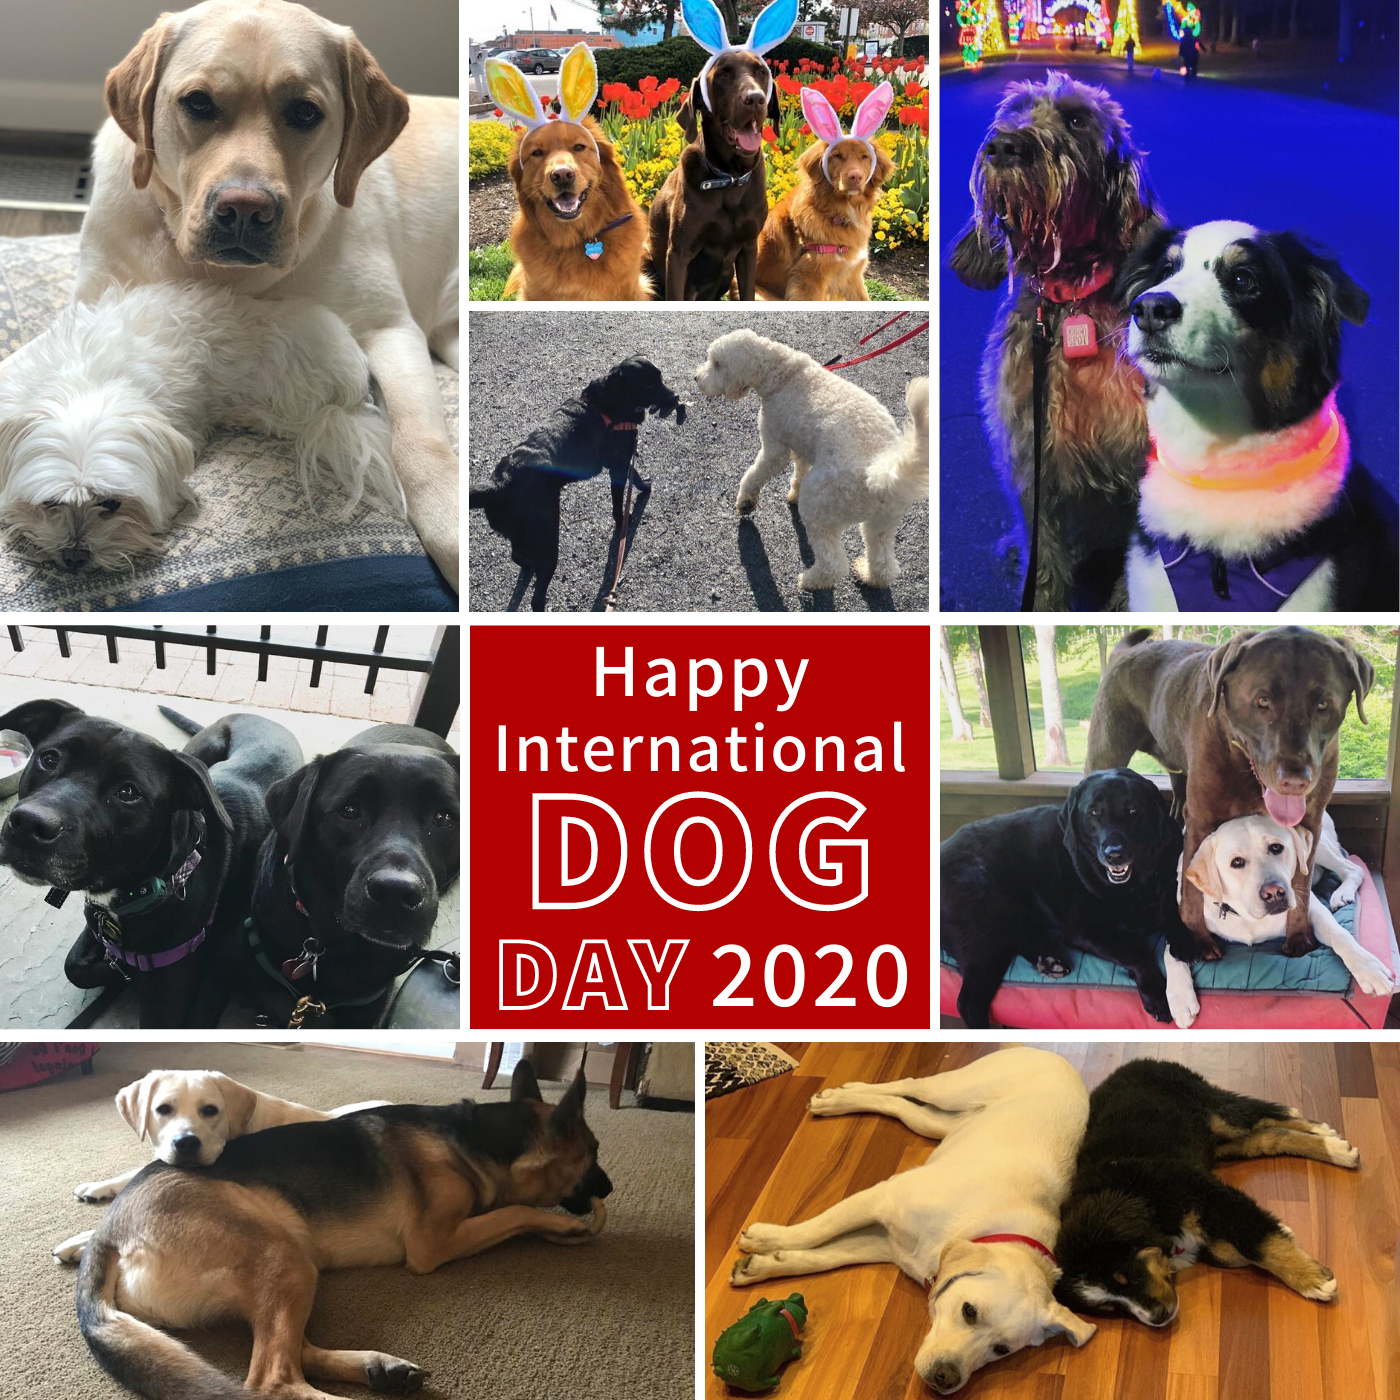 International Dog Day 2020 collage 2